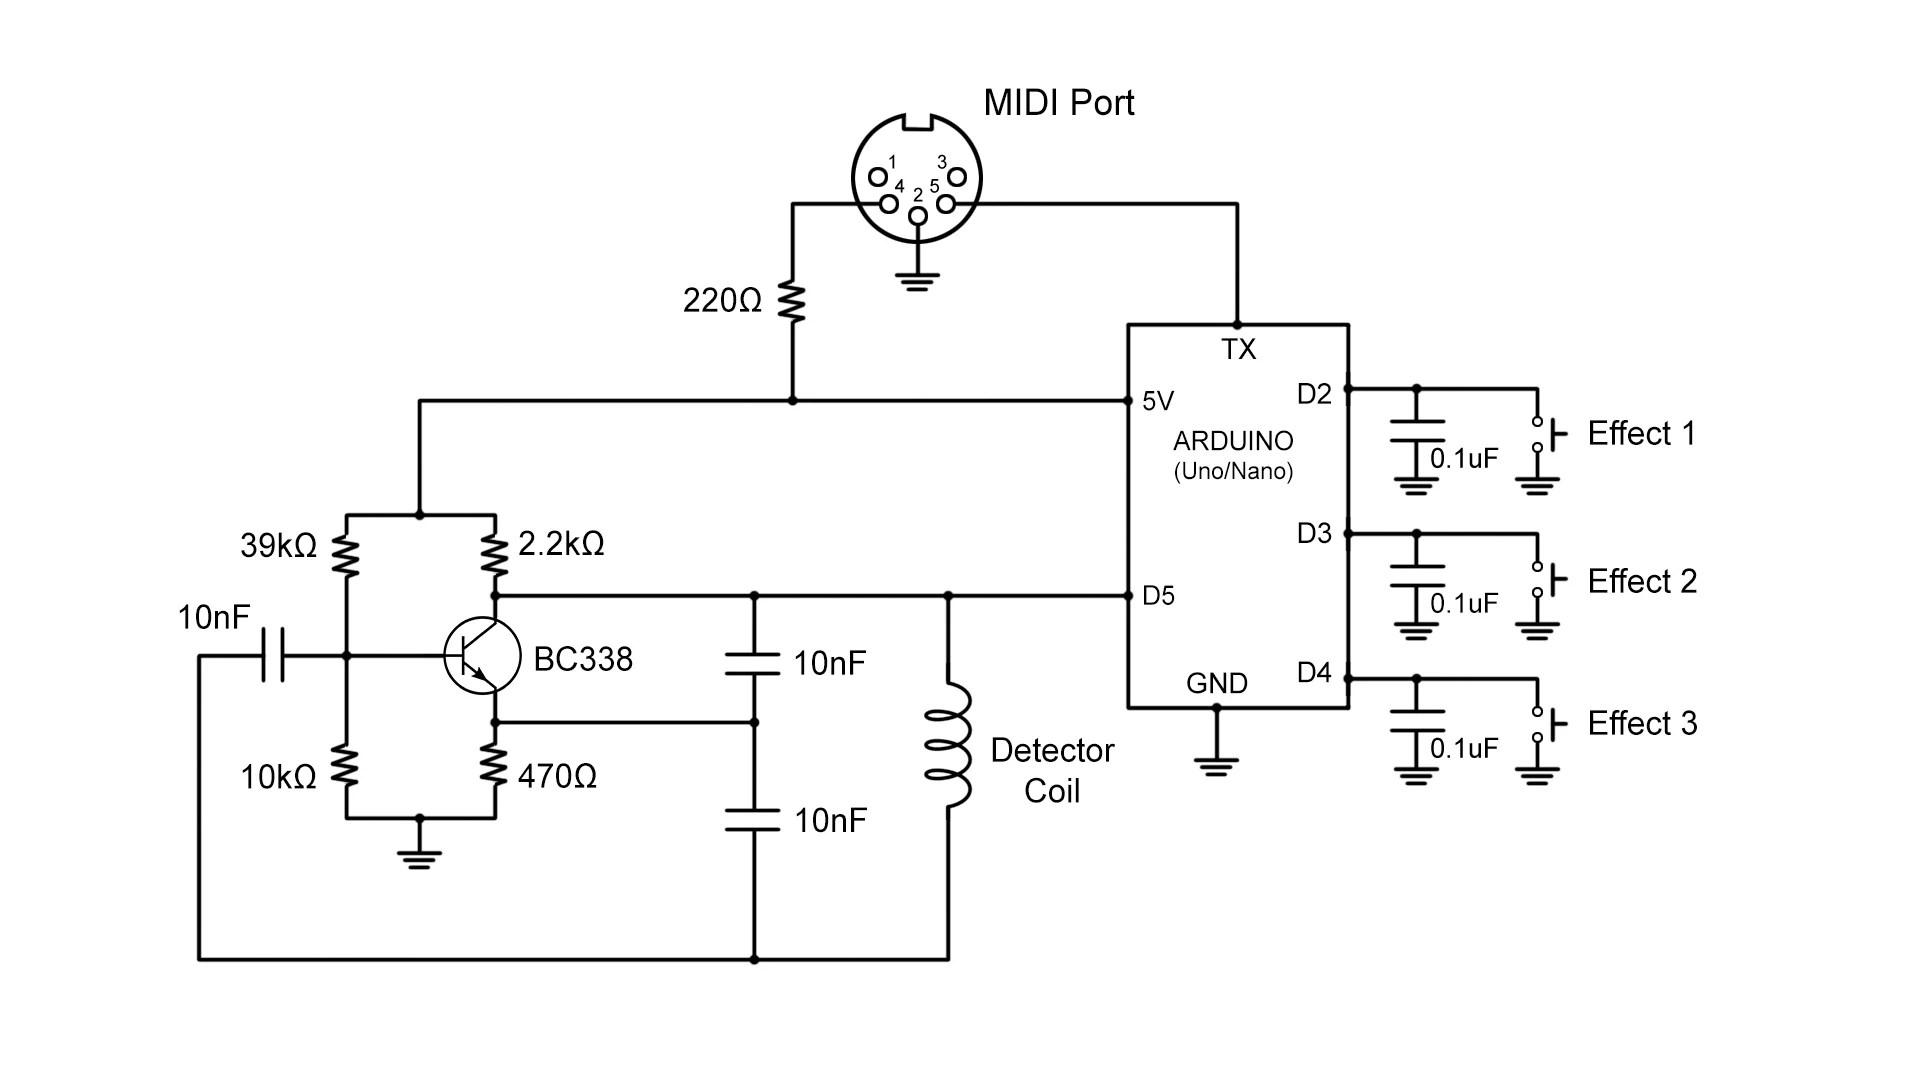 hight resolution of midi keyboard wiring diagram wiring diagrammidi keyboard wiring diagram